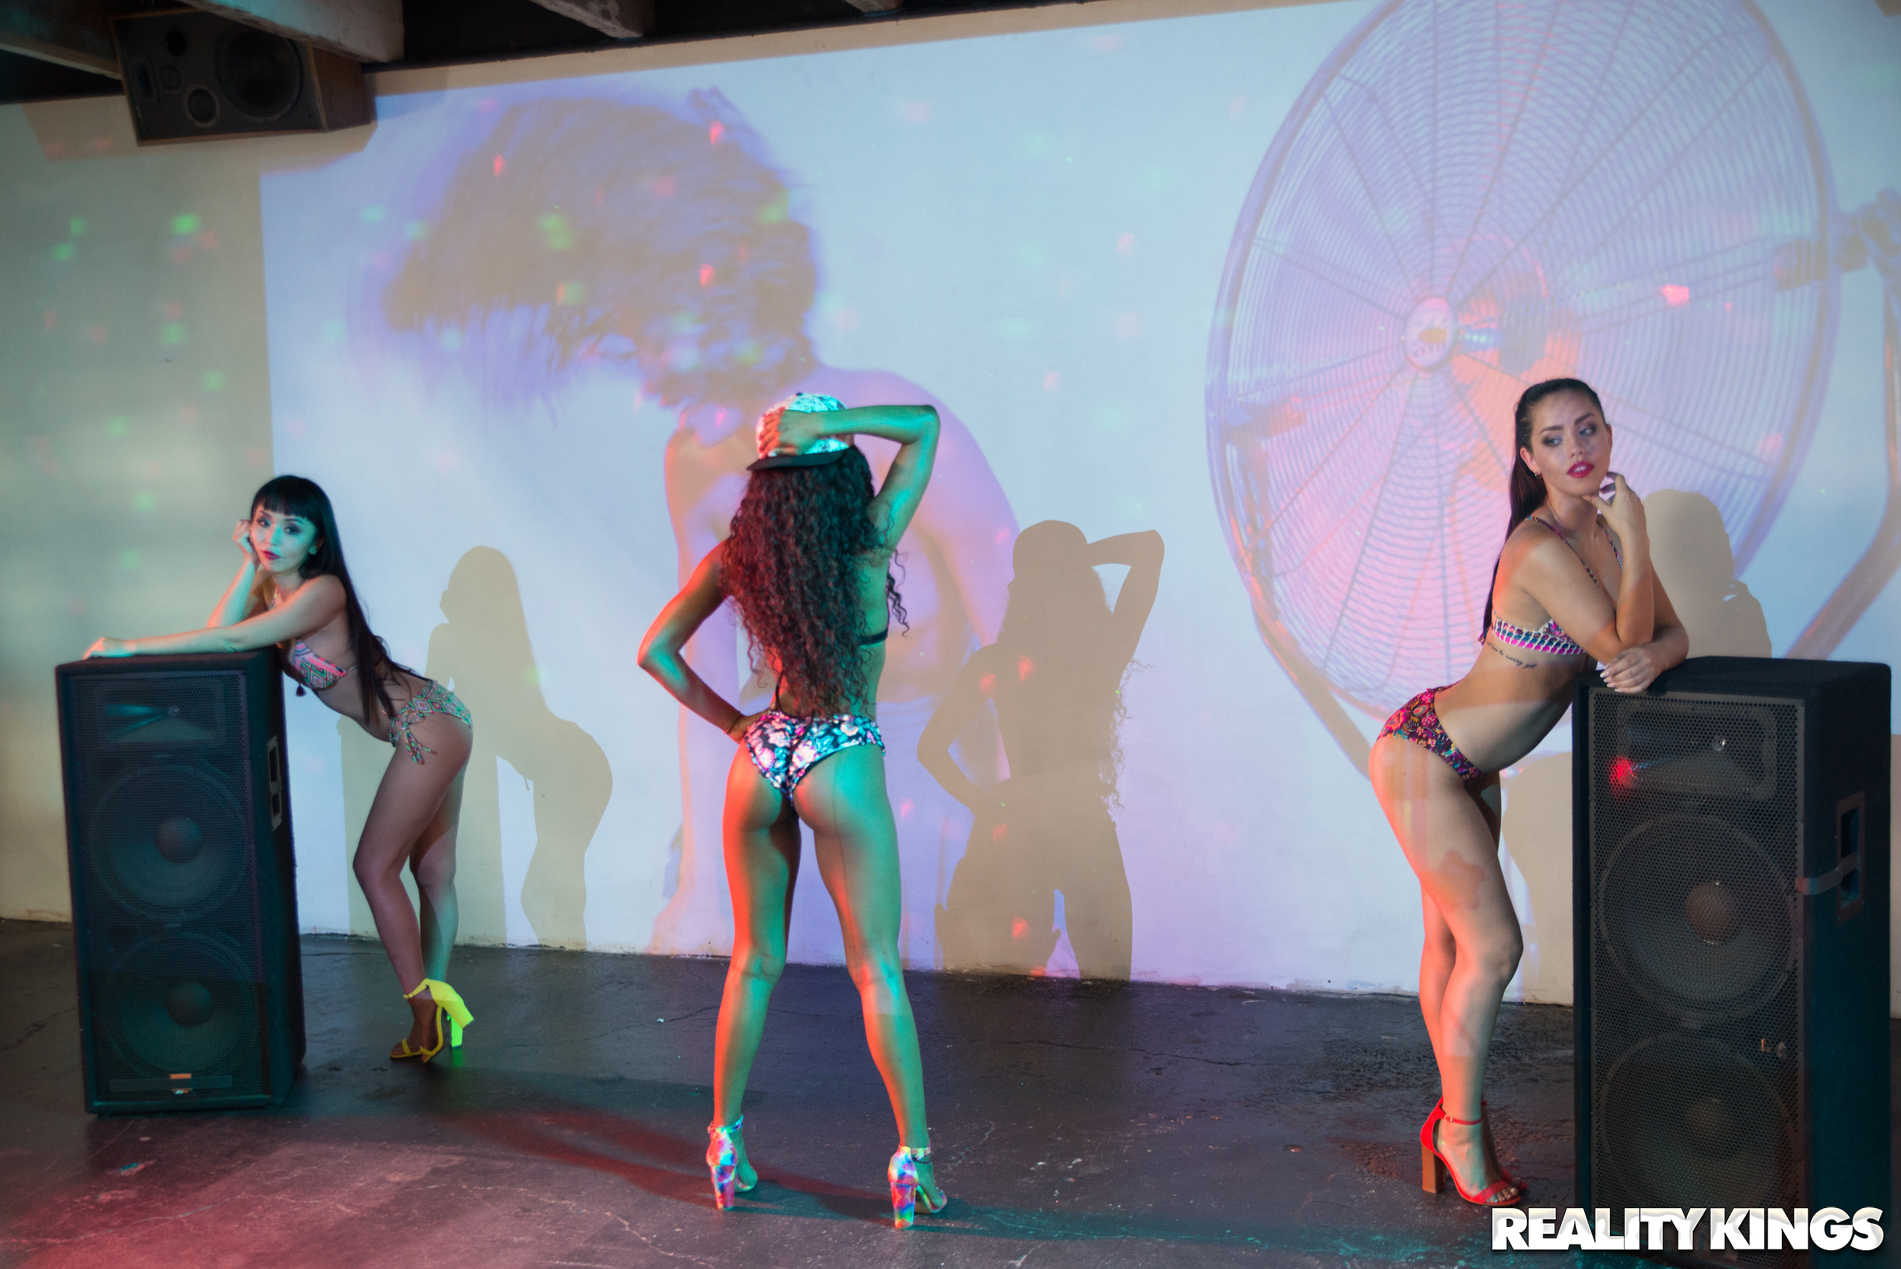 Reality Kings 'Rk Pop' starring Marica Hase (Photo 20)